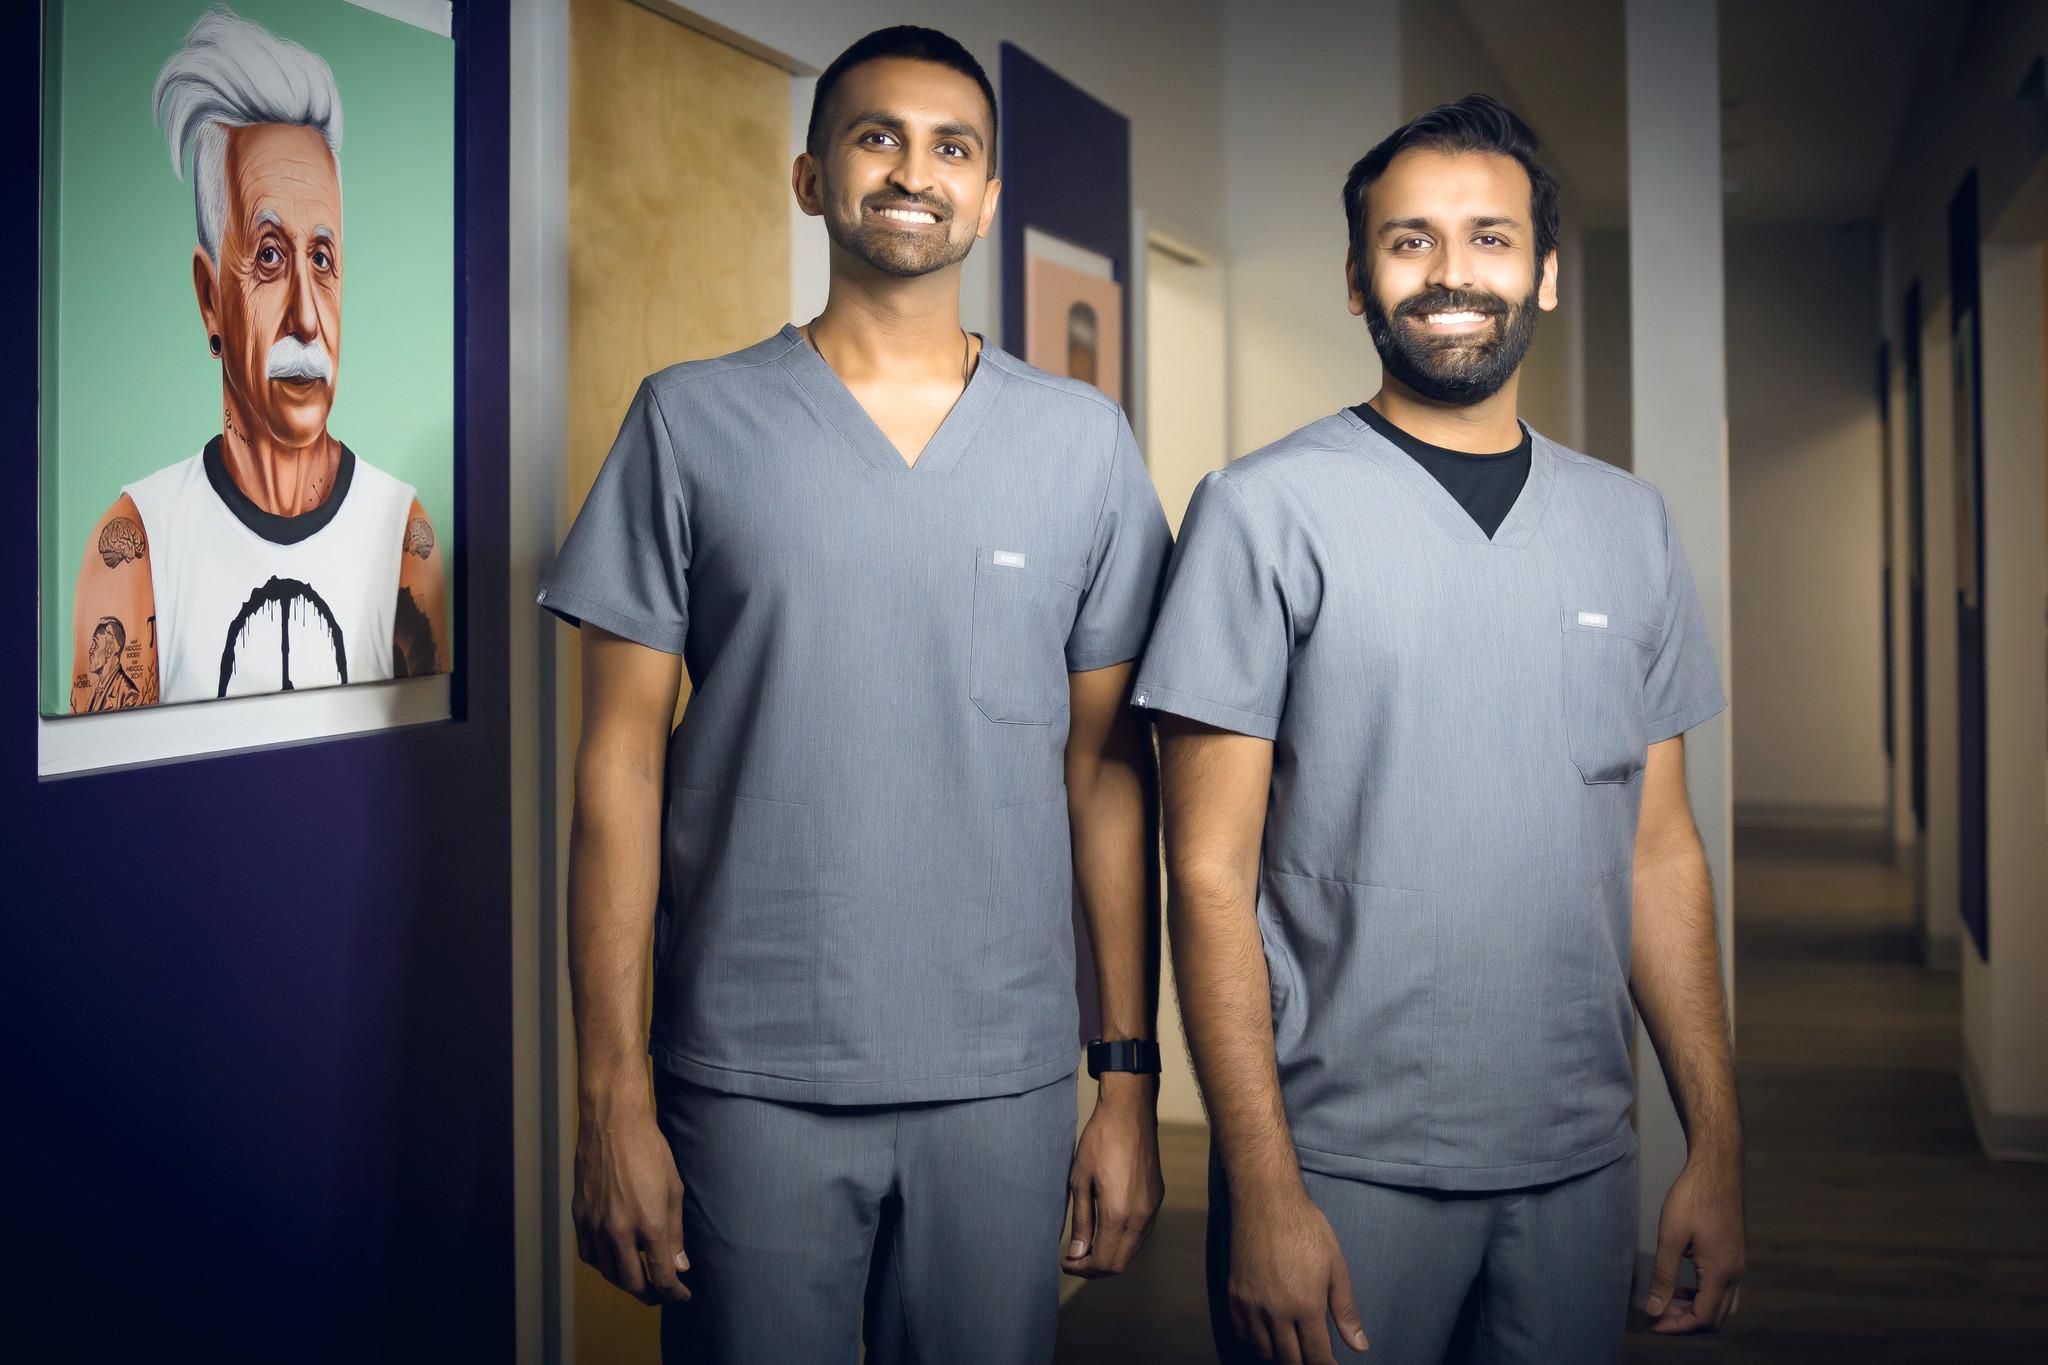 Equipo dental de South Lamar Austin Texas - Dr. Hardik Chodavadia y Dr. Devish H Patel